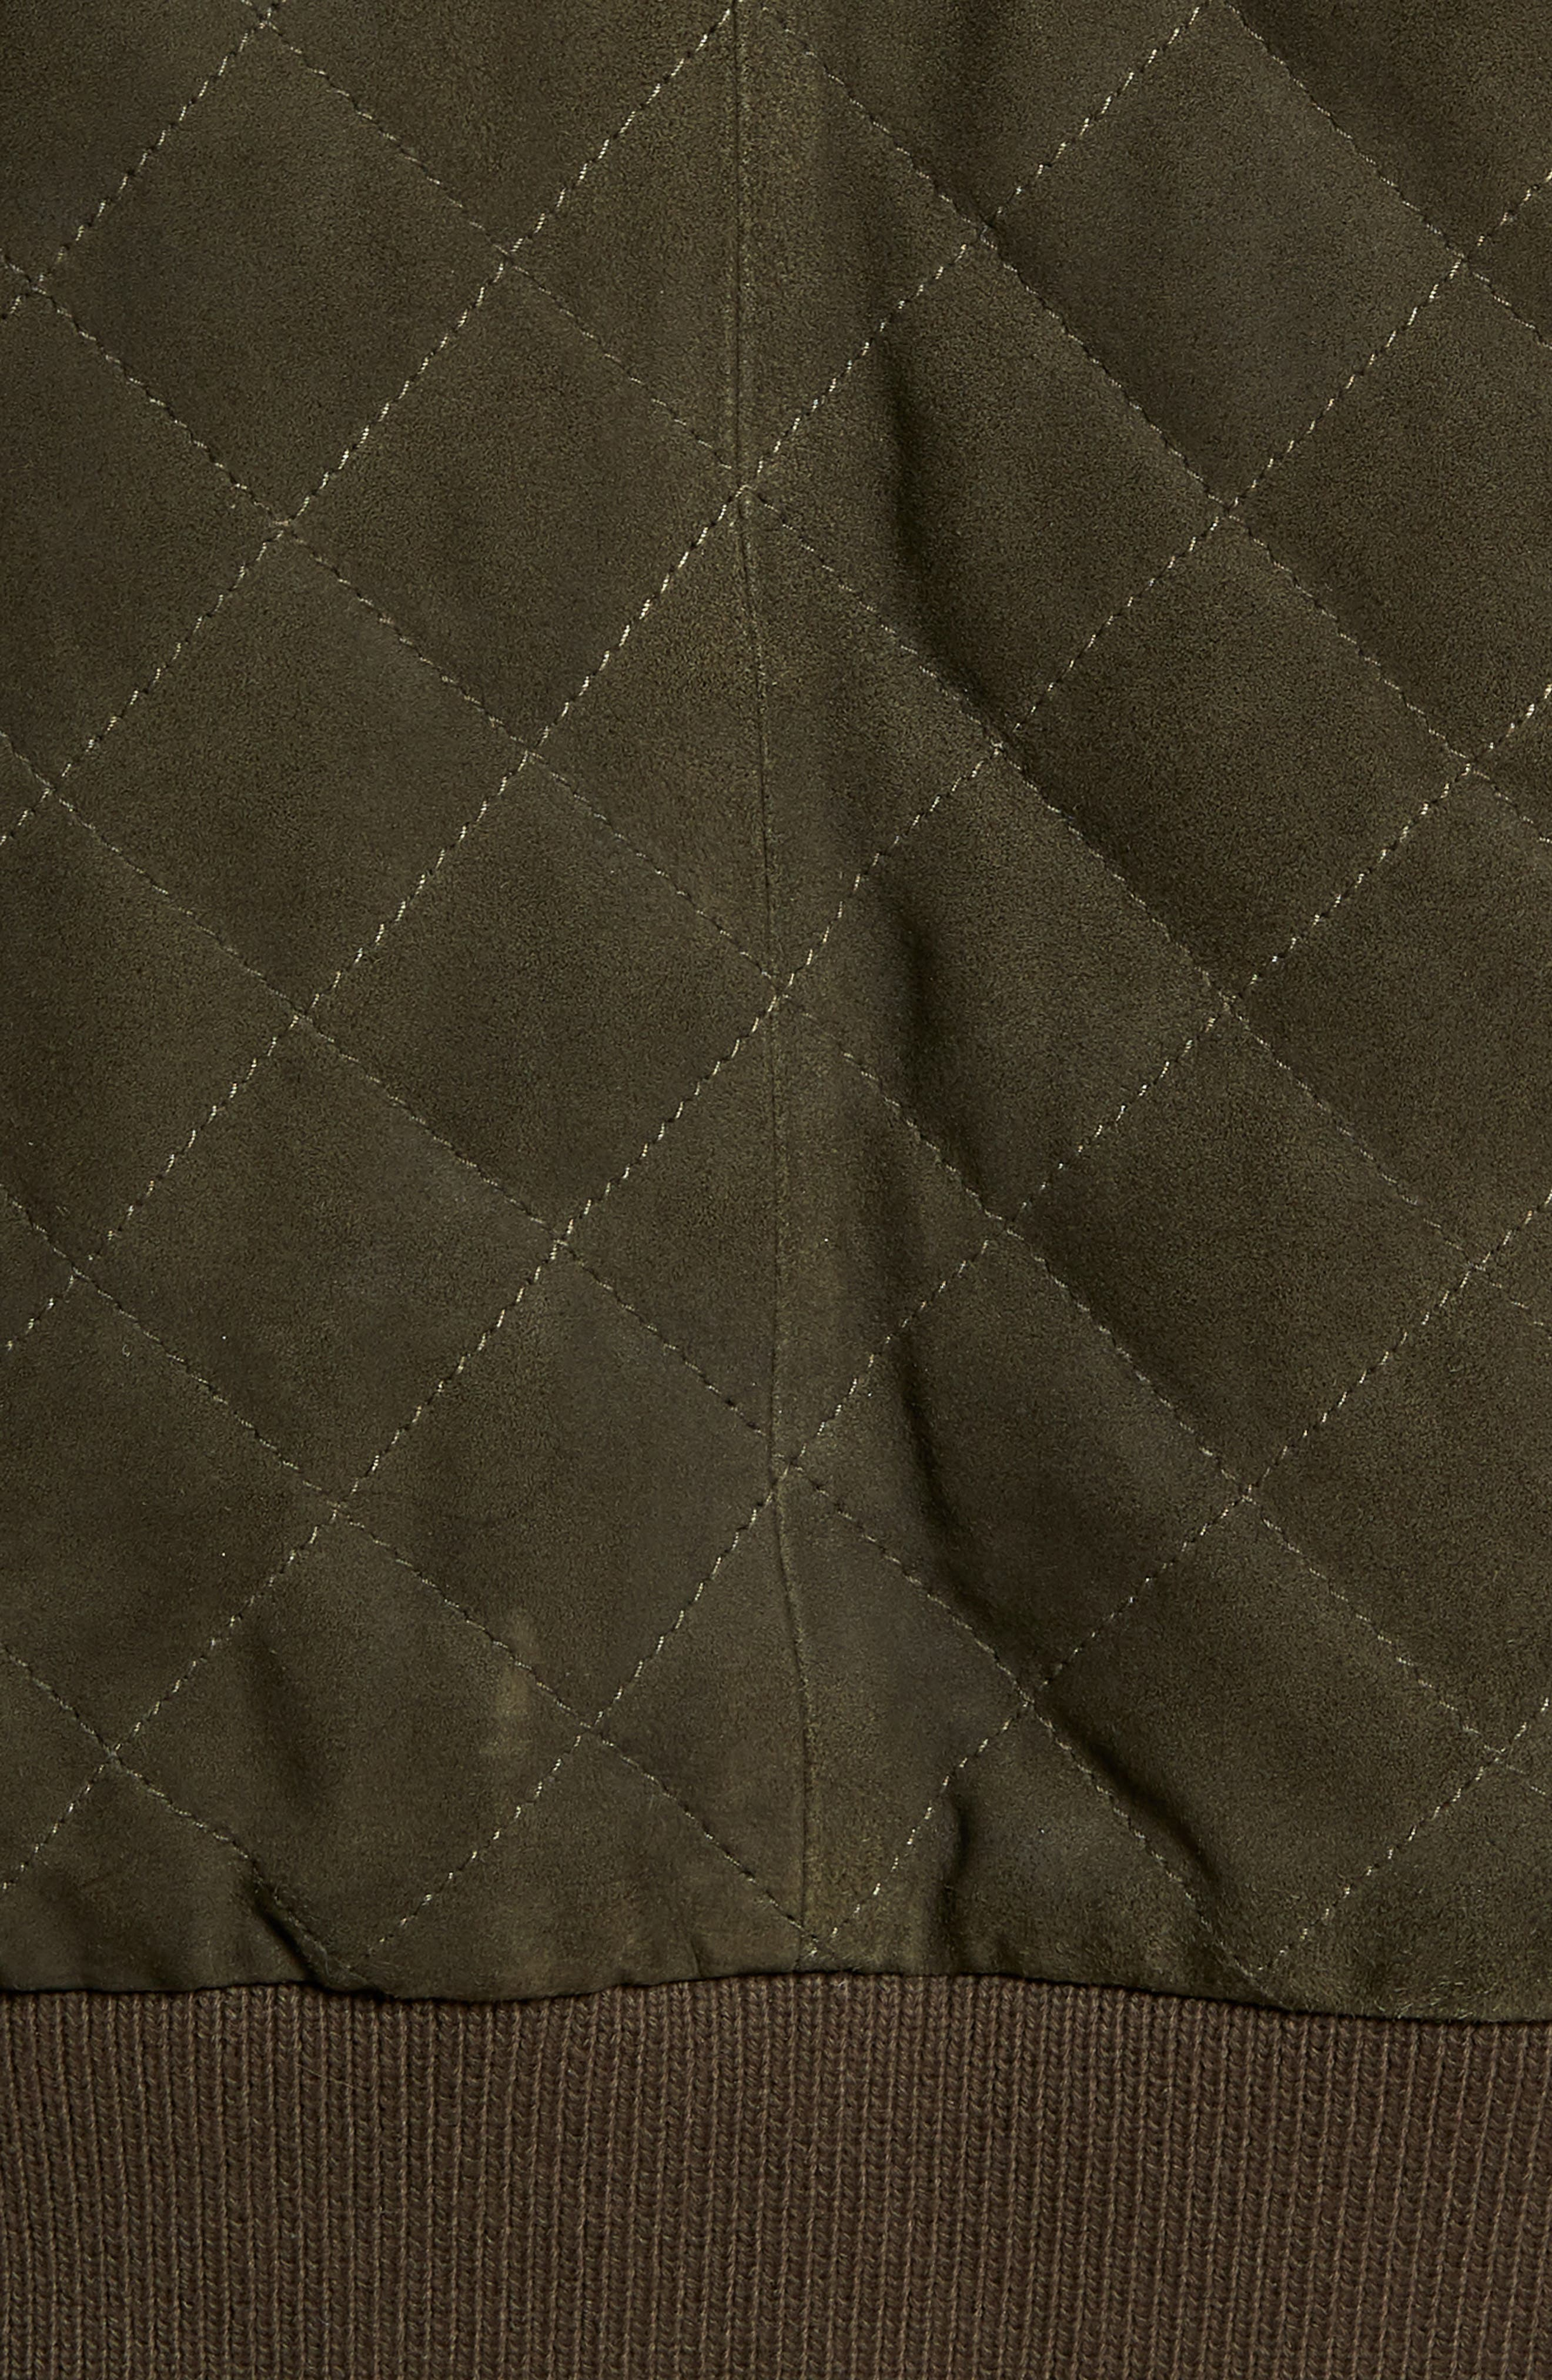 Regular Fit Quilted Suede Jacket,                             Alternate thumbnail 6, color,                             OLIVE